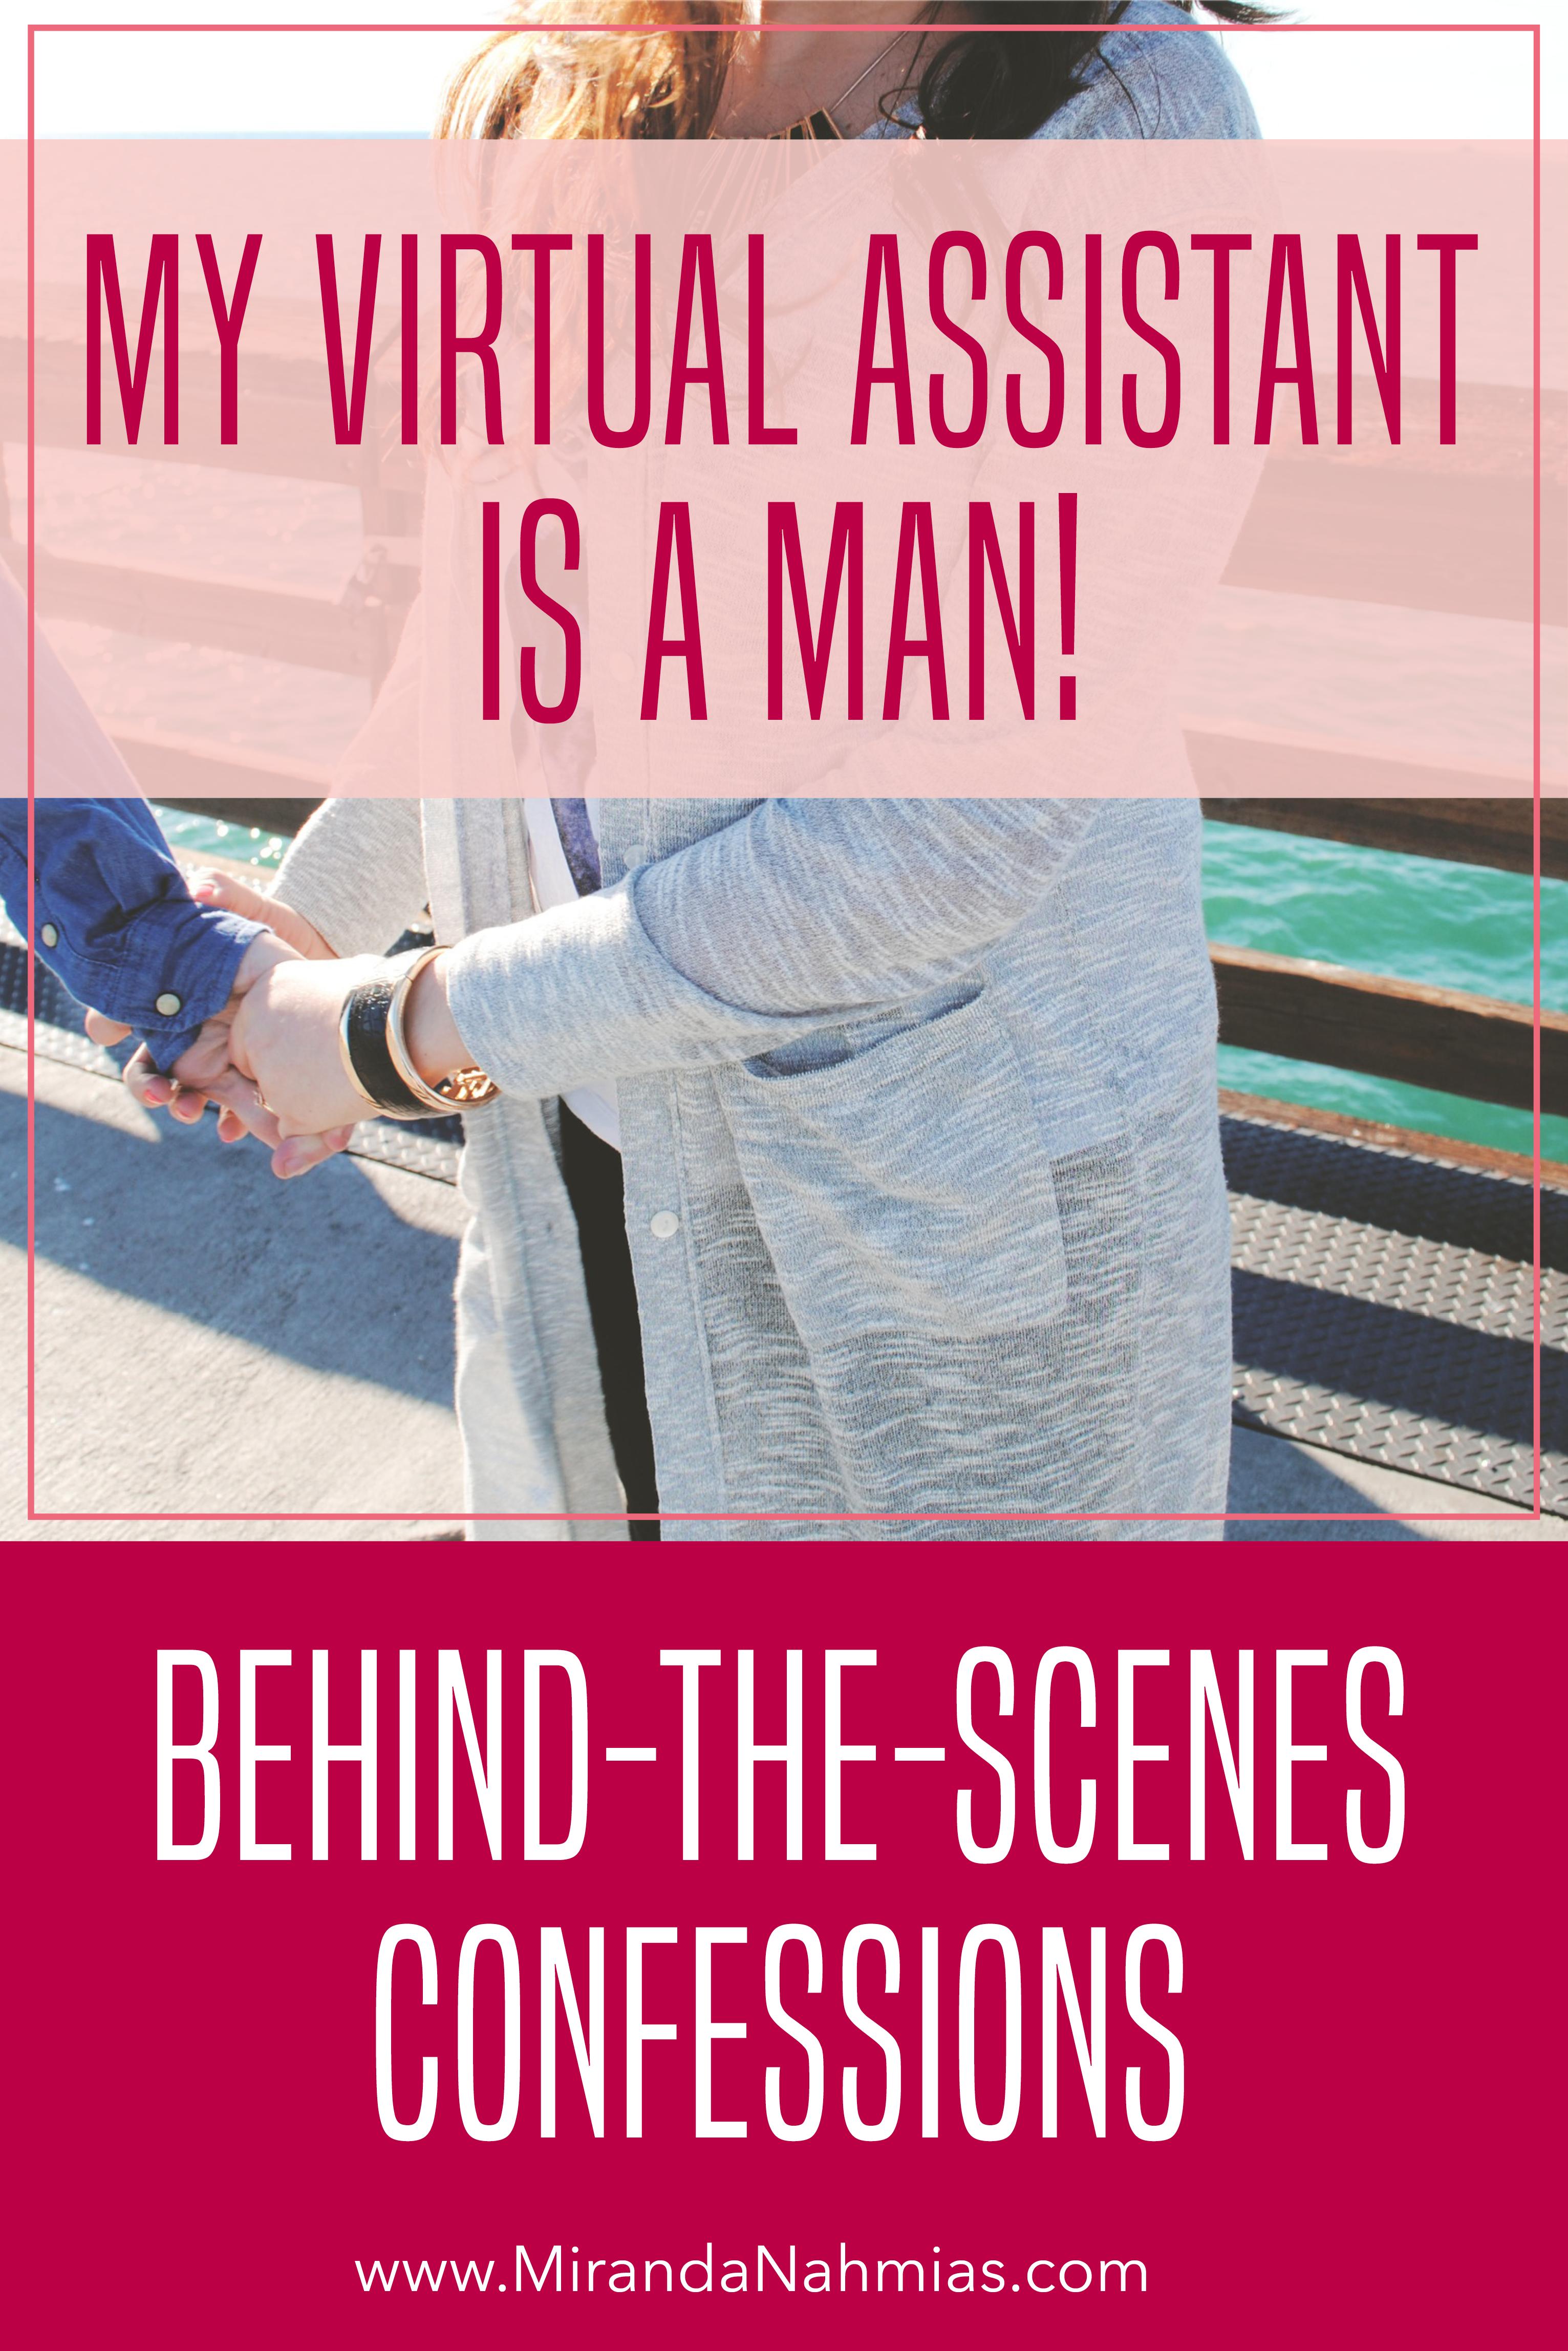 Behind the Scenes Confessions: My Virtual Assistant is a Man! via @mirandanahmias